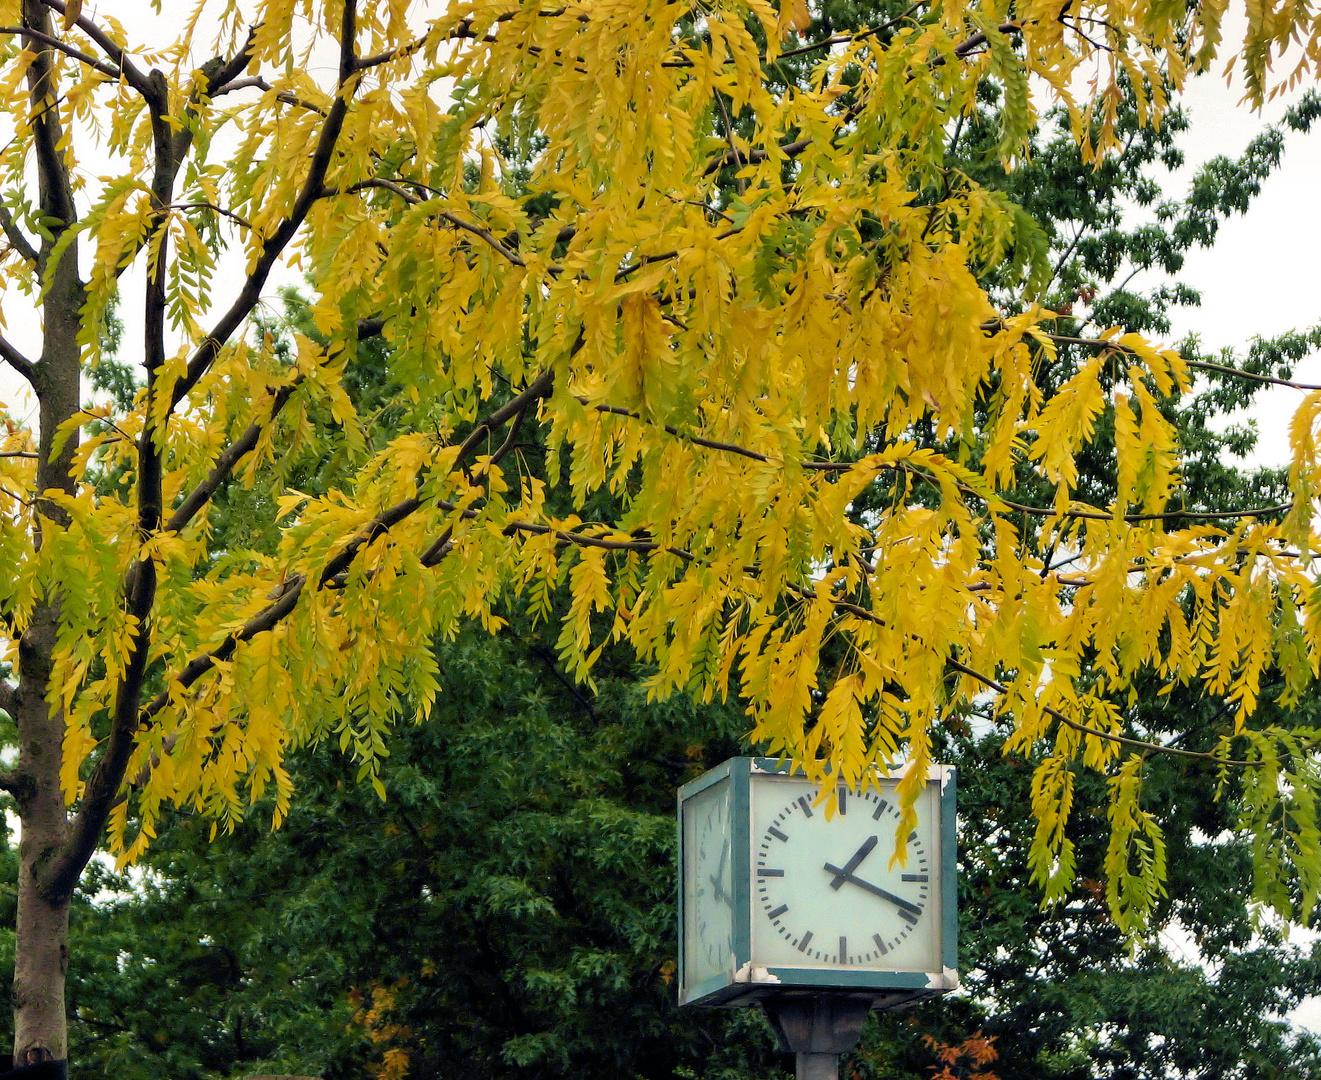 Herbst in Lippstadt